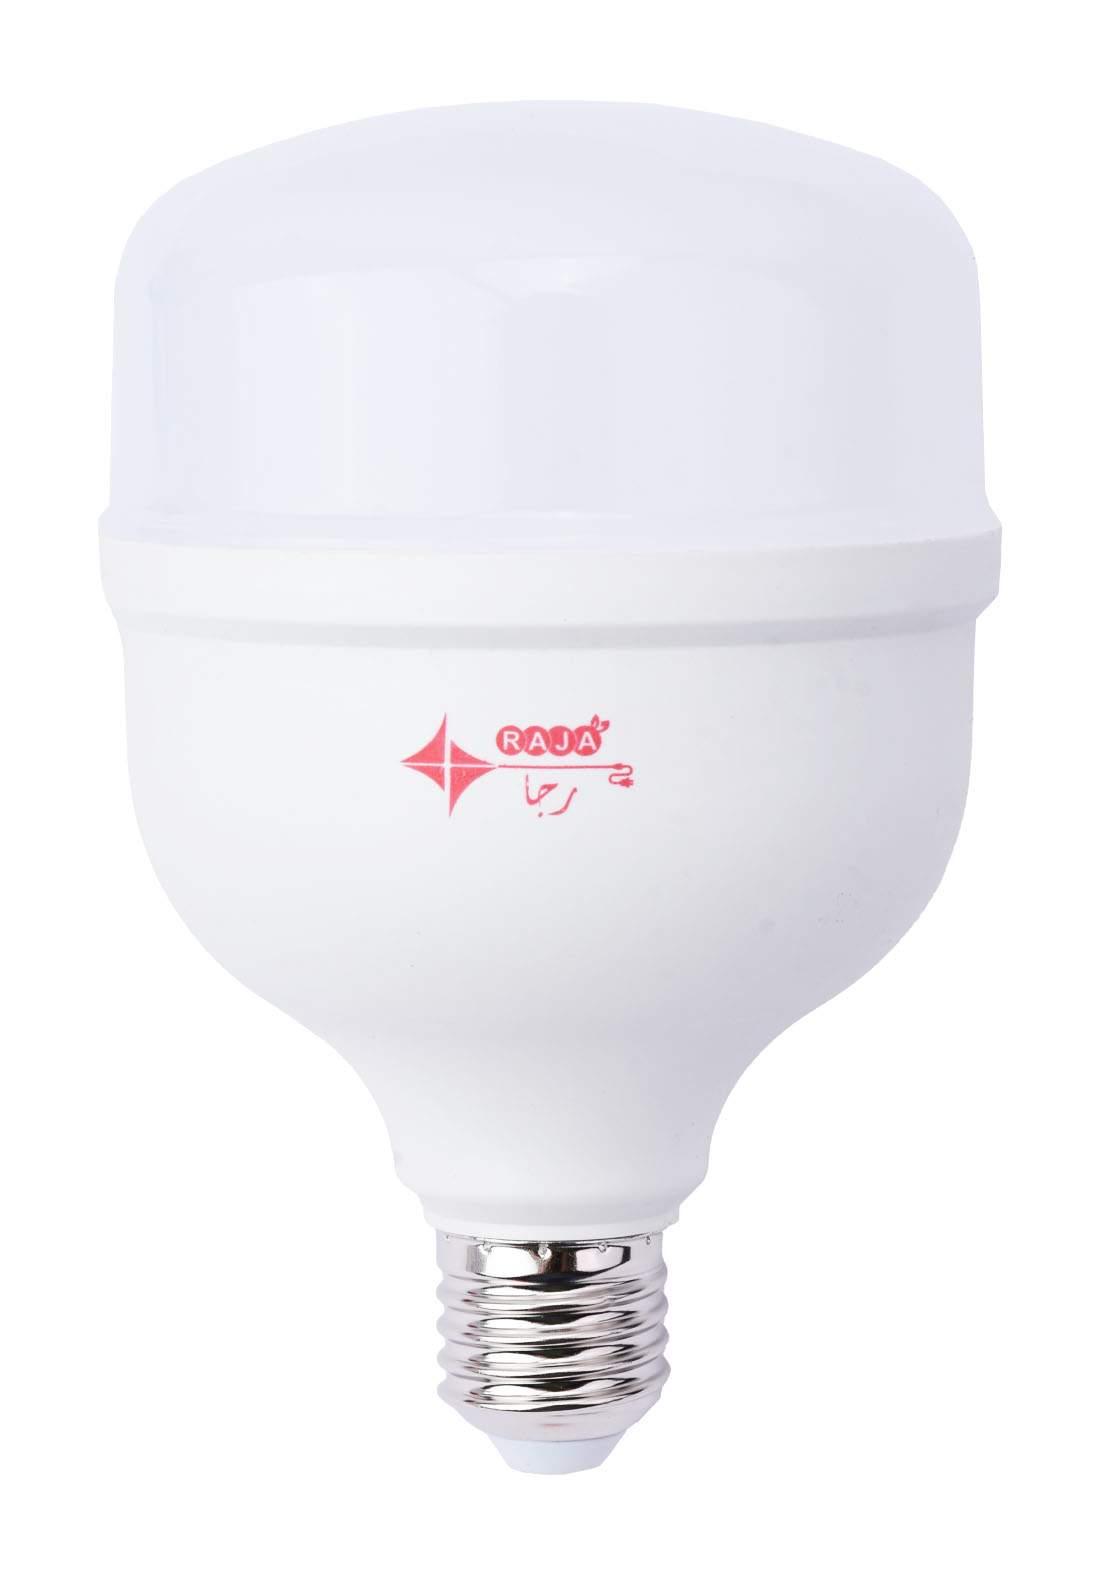 Raja LED-High Power Corn Lamp 18 W مصباح ليد سن